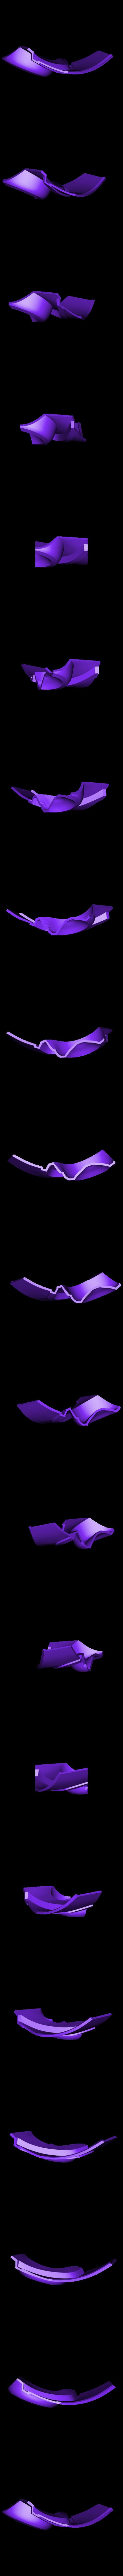 Part_3_v4.stl Download free STL file  Blood Dragon Helmet Mass Effect 2 (With Back Access) • 3D printable template, VillainousPropShop